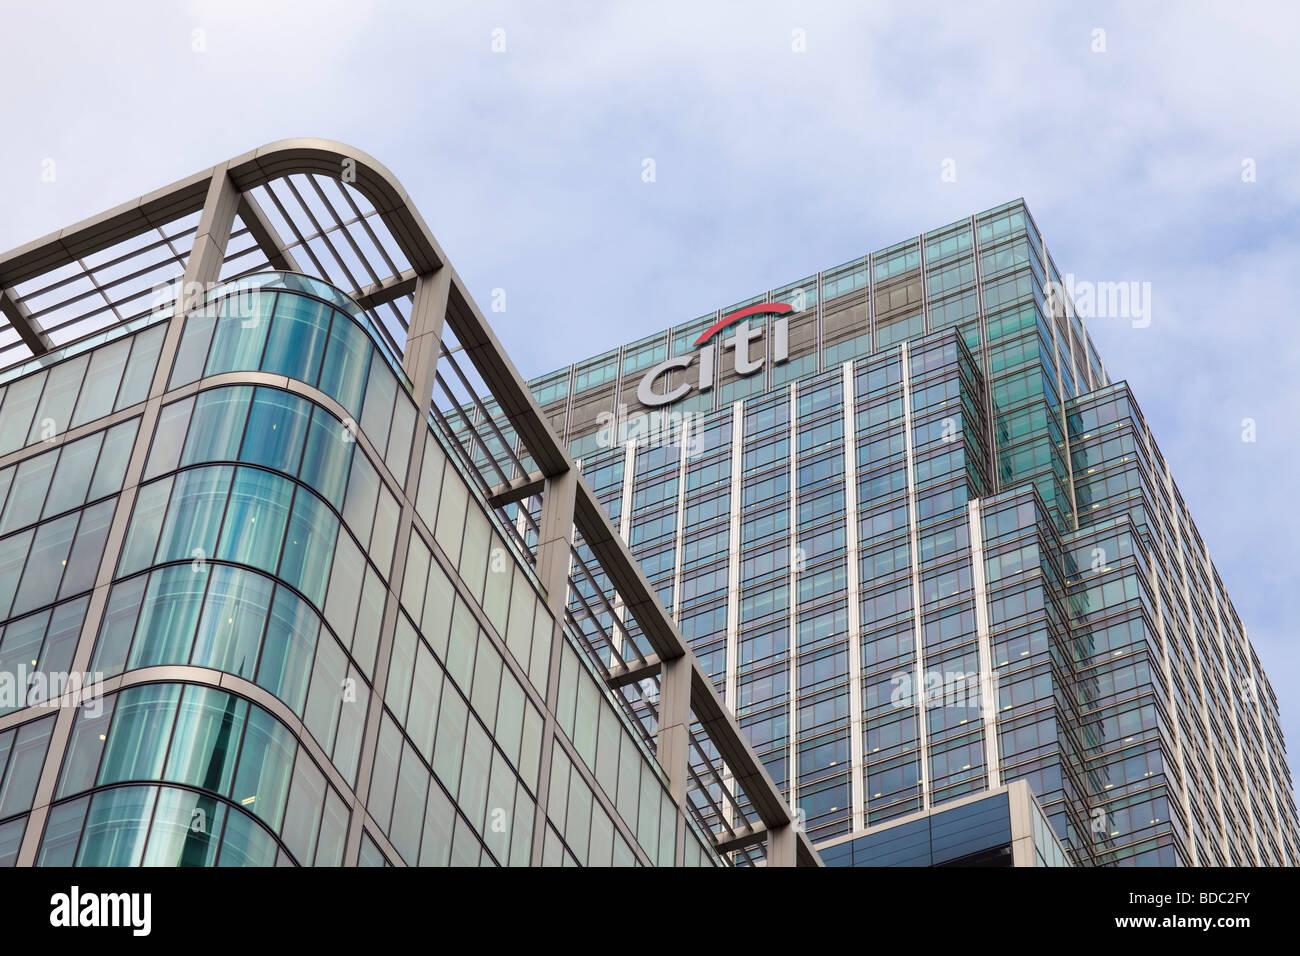 CITI Bank in London - Stock Image